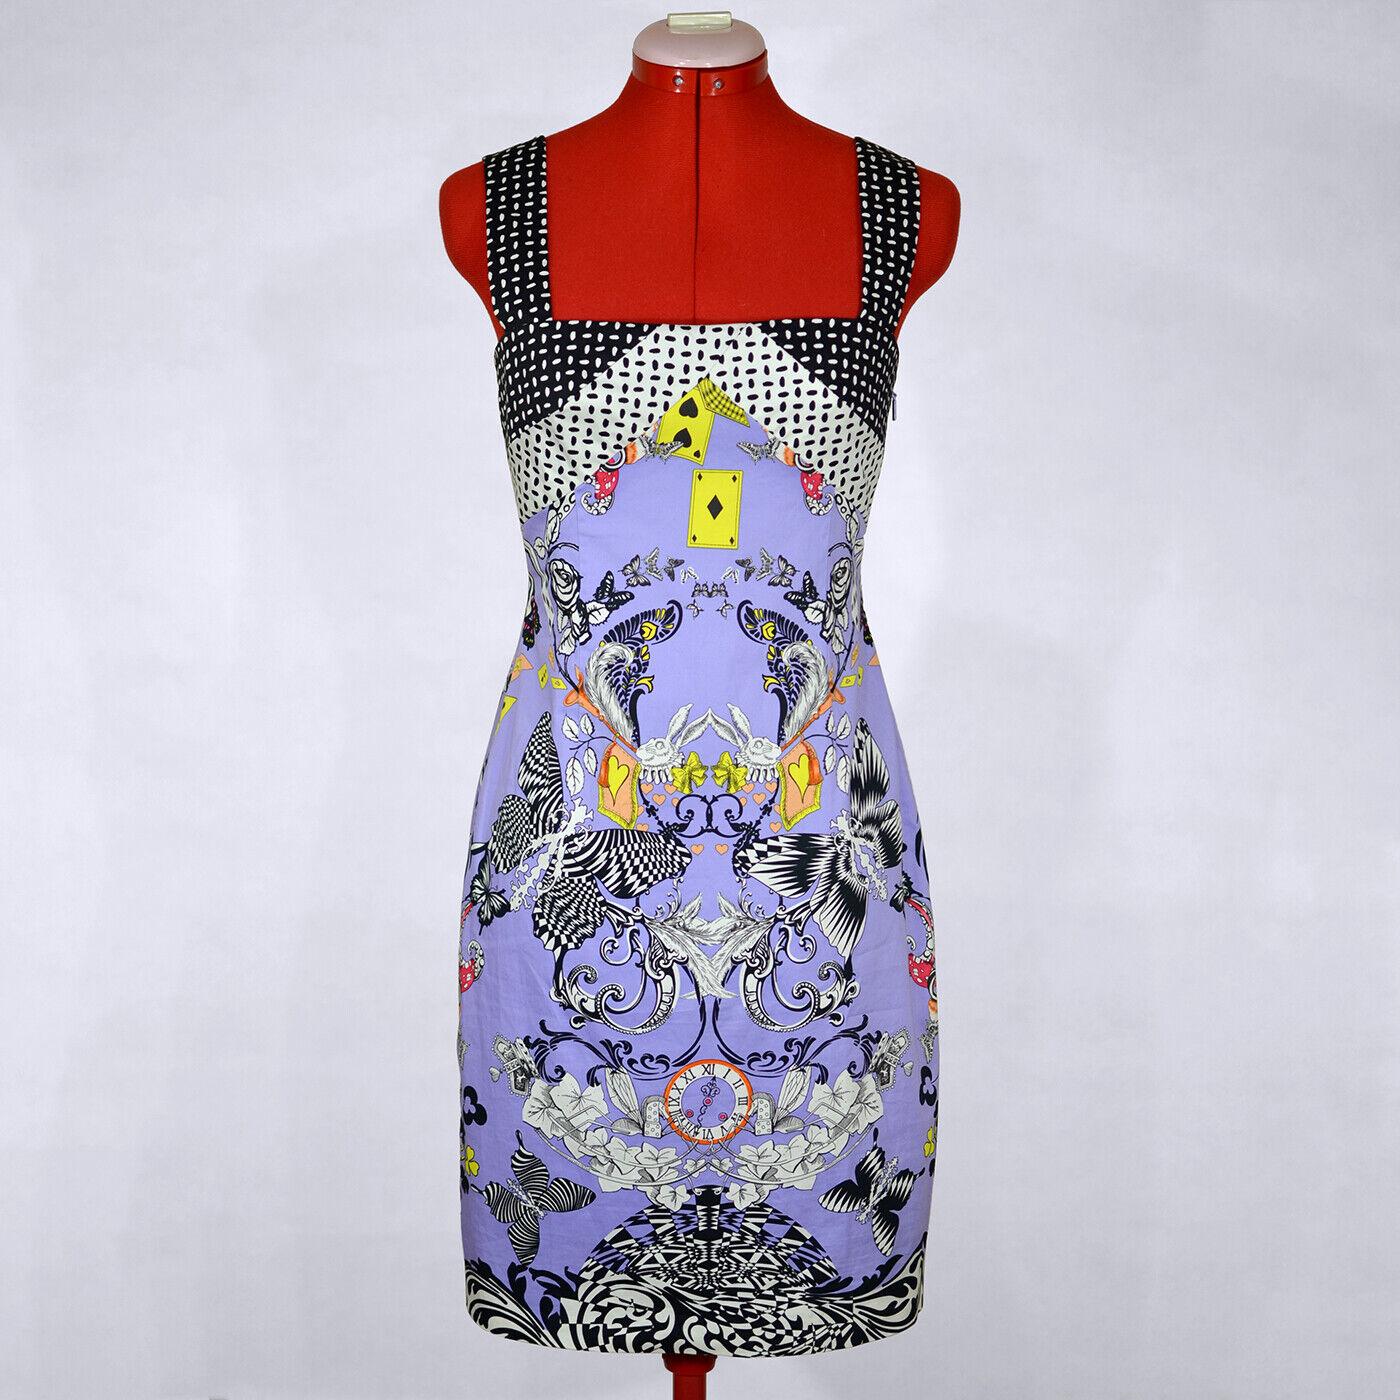 VERSACE Sleeveless Purple Sheath Dress Spring 2010  Alice in Wonderland  Size S